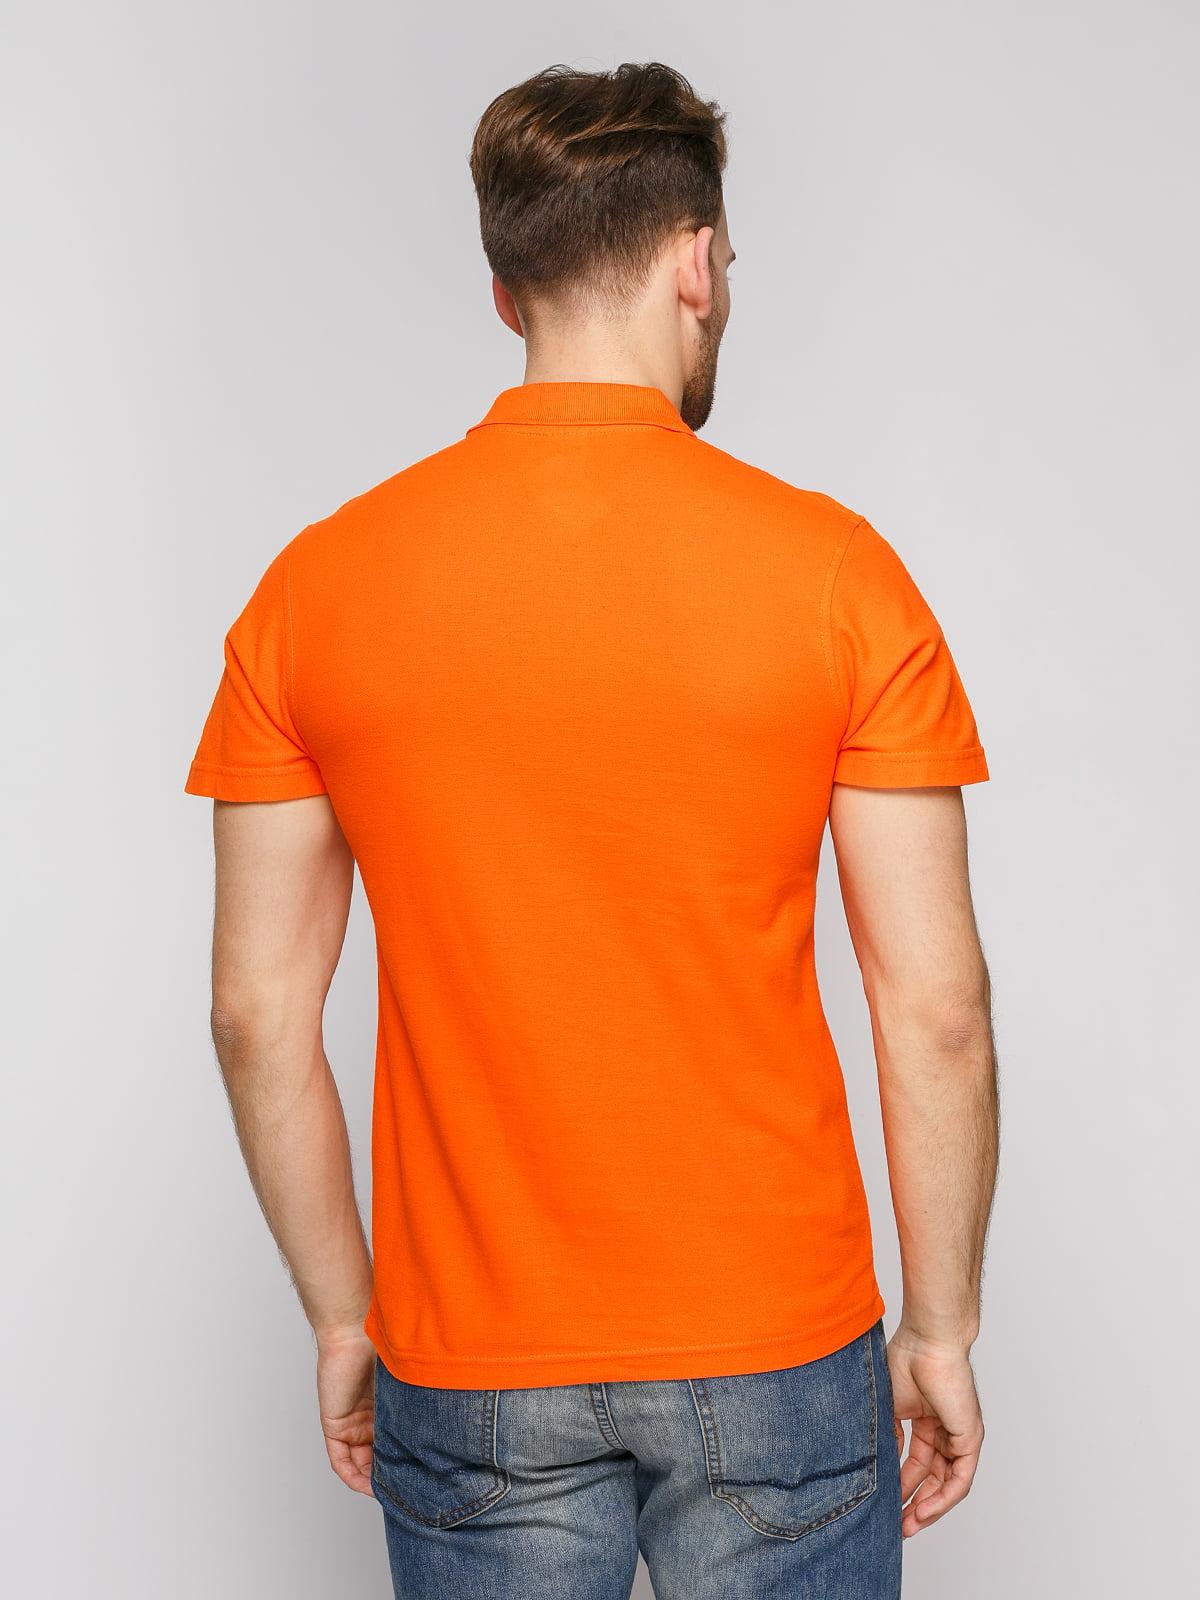 Футболка-поло оранжевая | 4812200 | фото 2